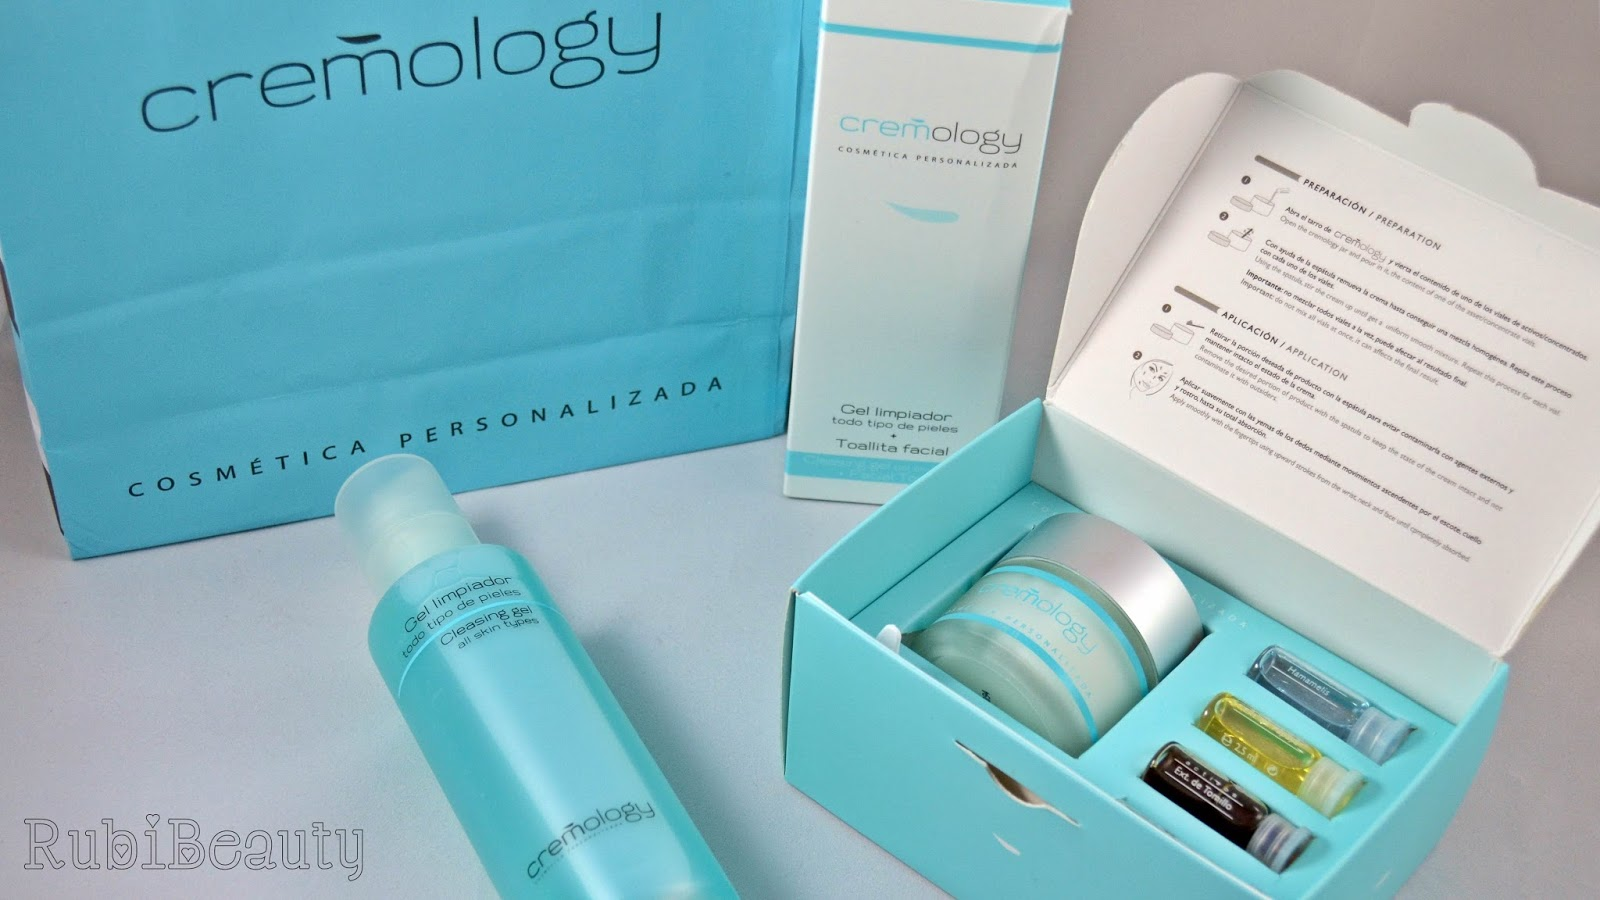 rubibeauty review opinion cremology crema rutina facial personalizada